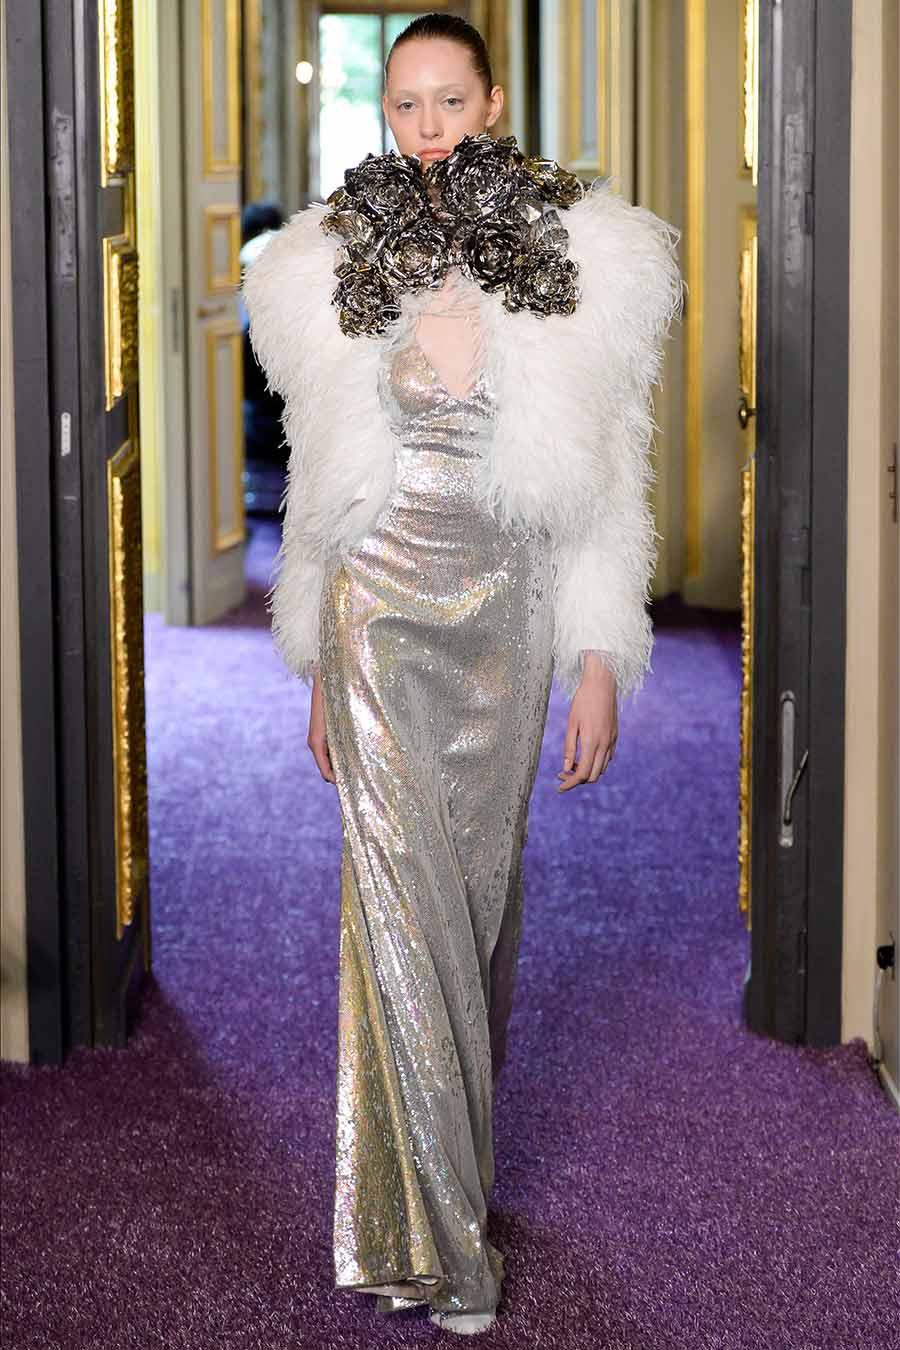 cristalli-look-shining-san-silvestro-francesco-scognamiglio-haute-couture-img2